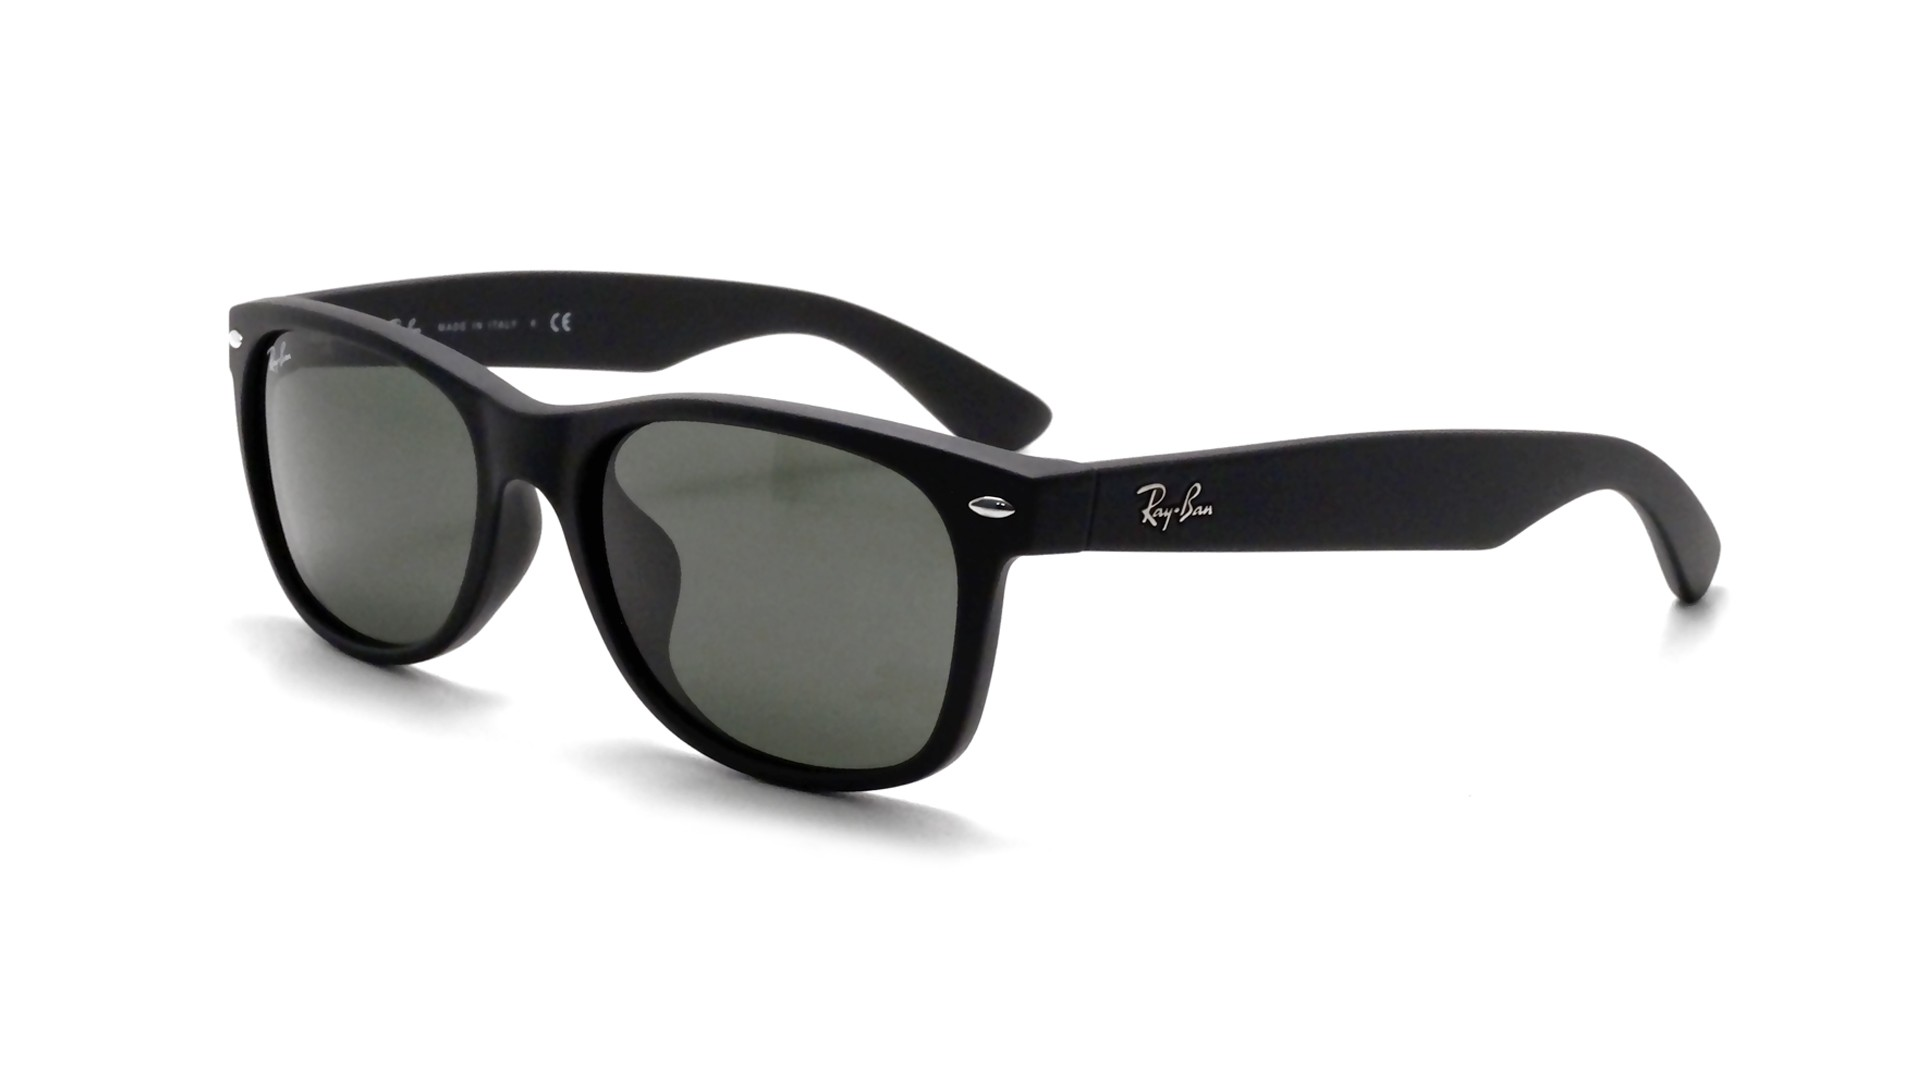 ray ban wayfarer sunglasses asian fit  ray ban new wayfarer asian fit black matte g15 rb2132f 622 55 18 large 69,